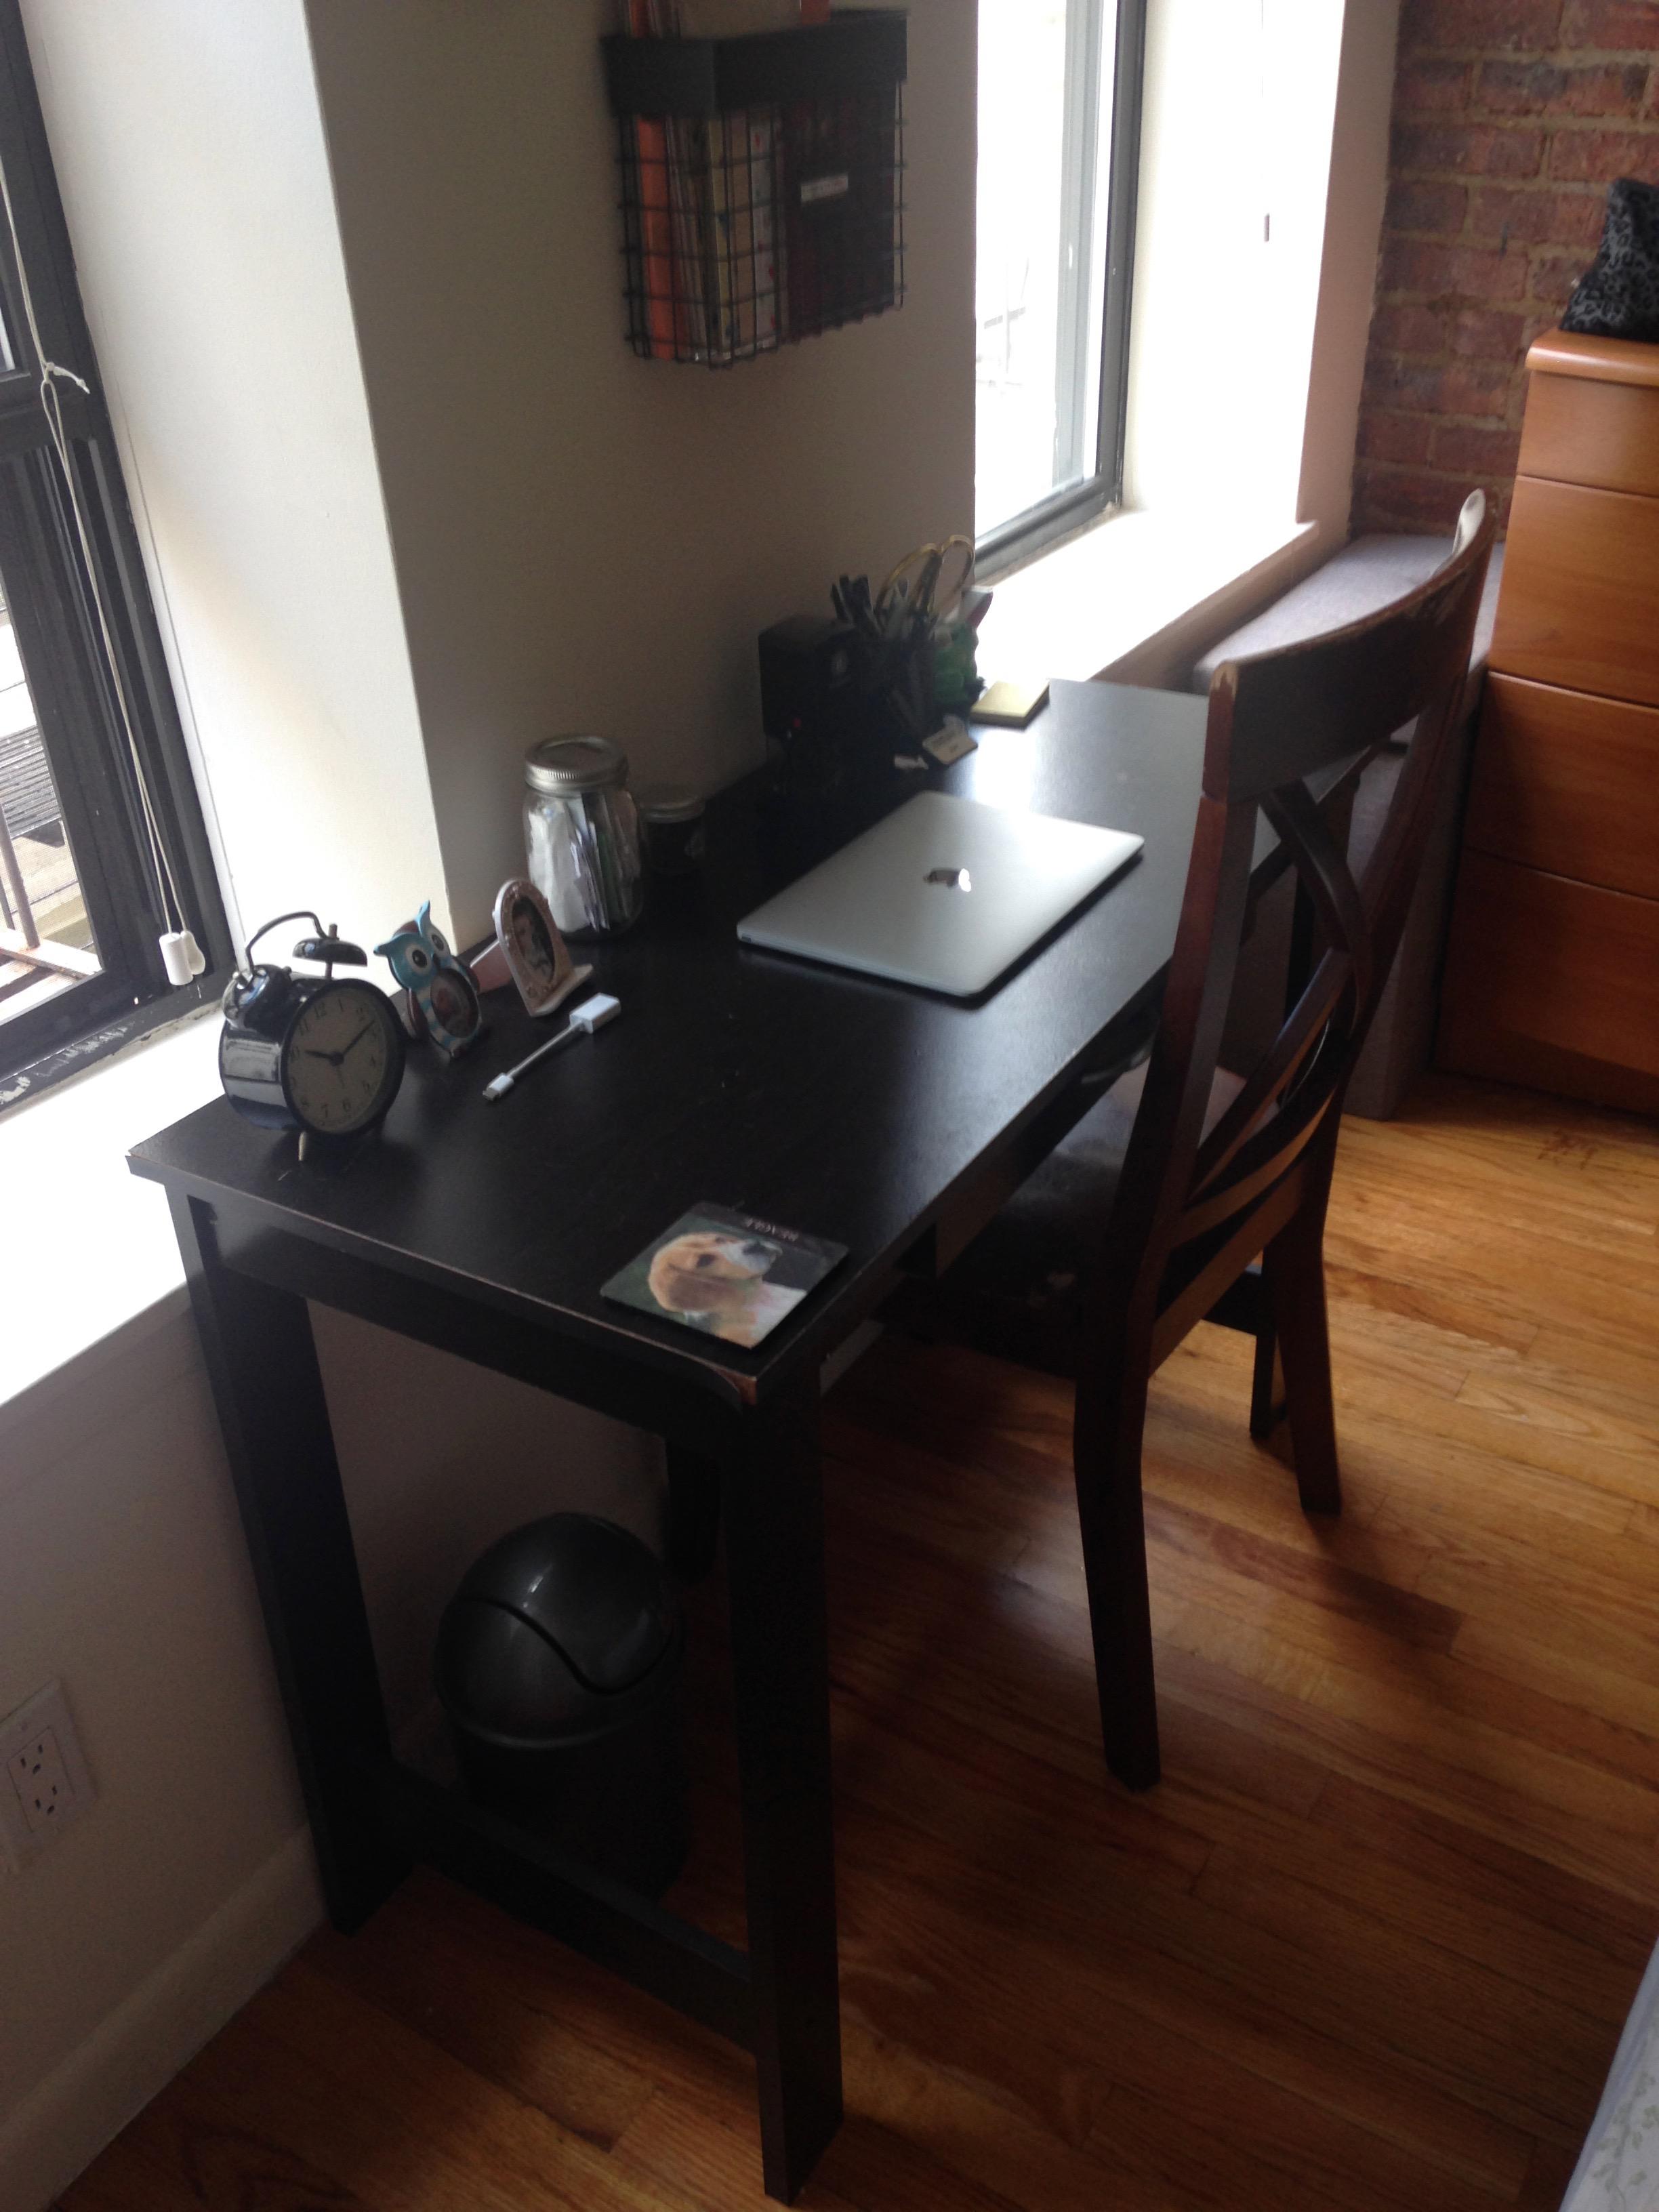 6. Desk!